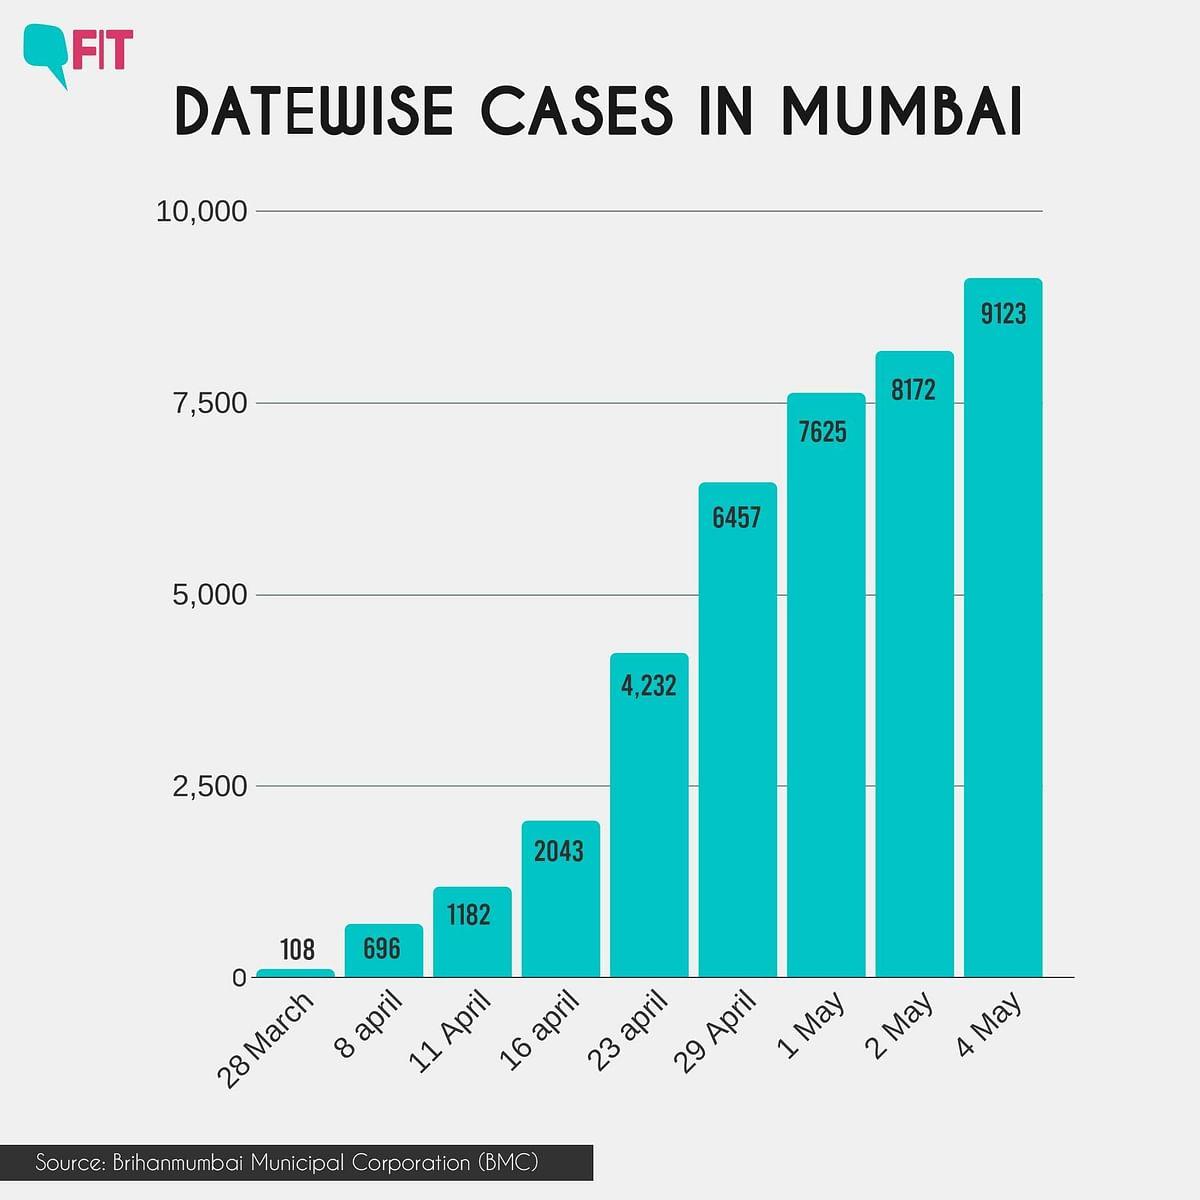 Datewise positive coronavirus cases in Mumbai.